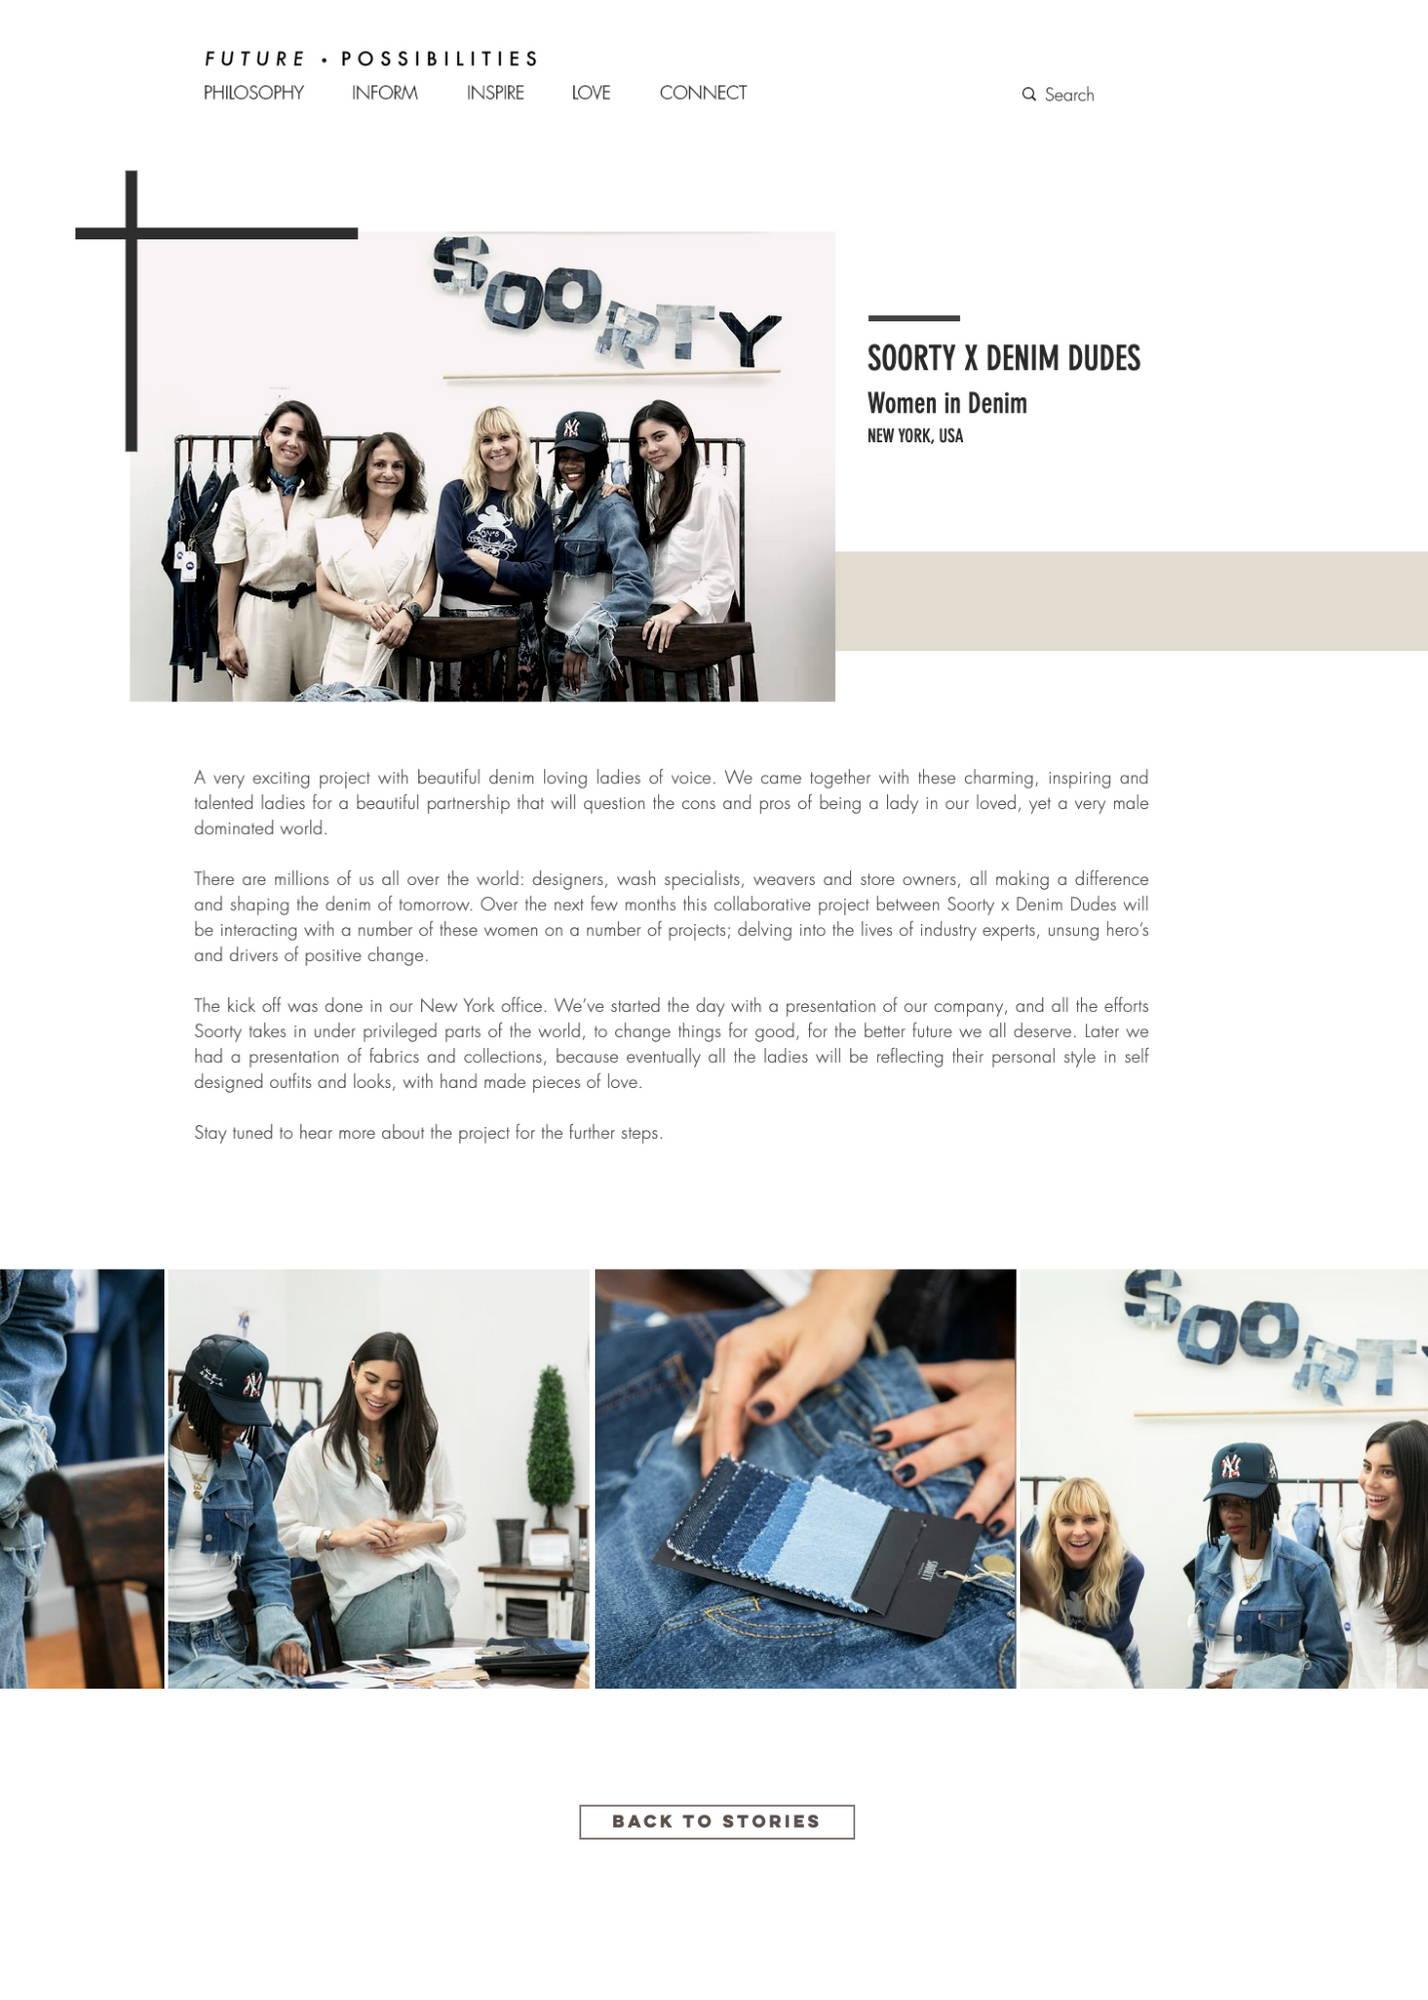 SOORTY X DENIM DUDES  Women in Denim Article